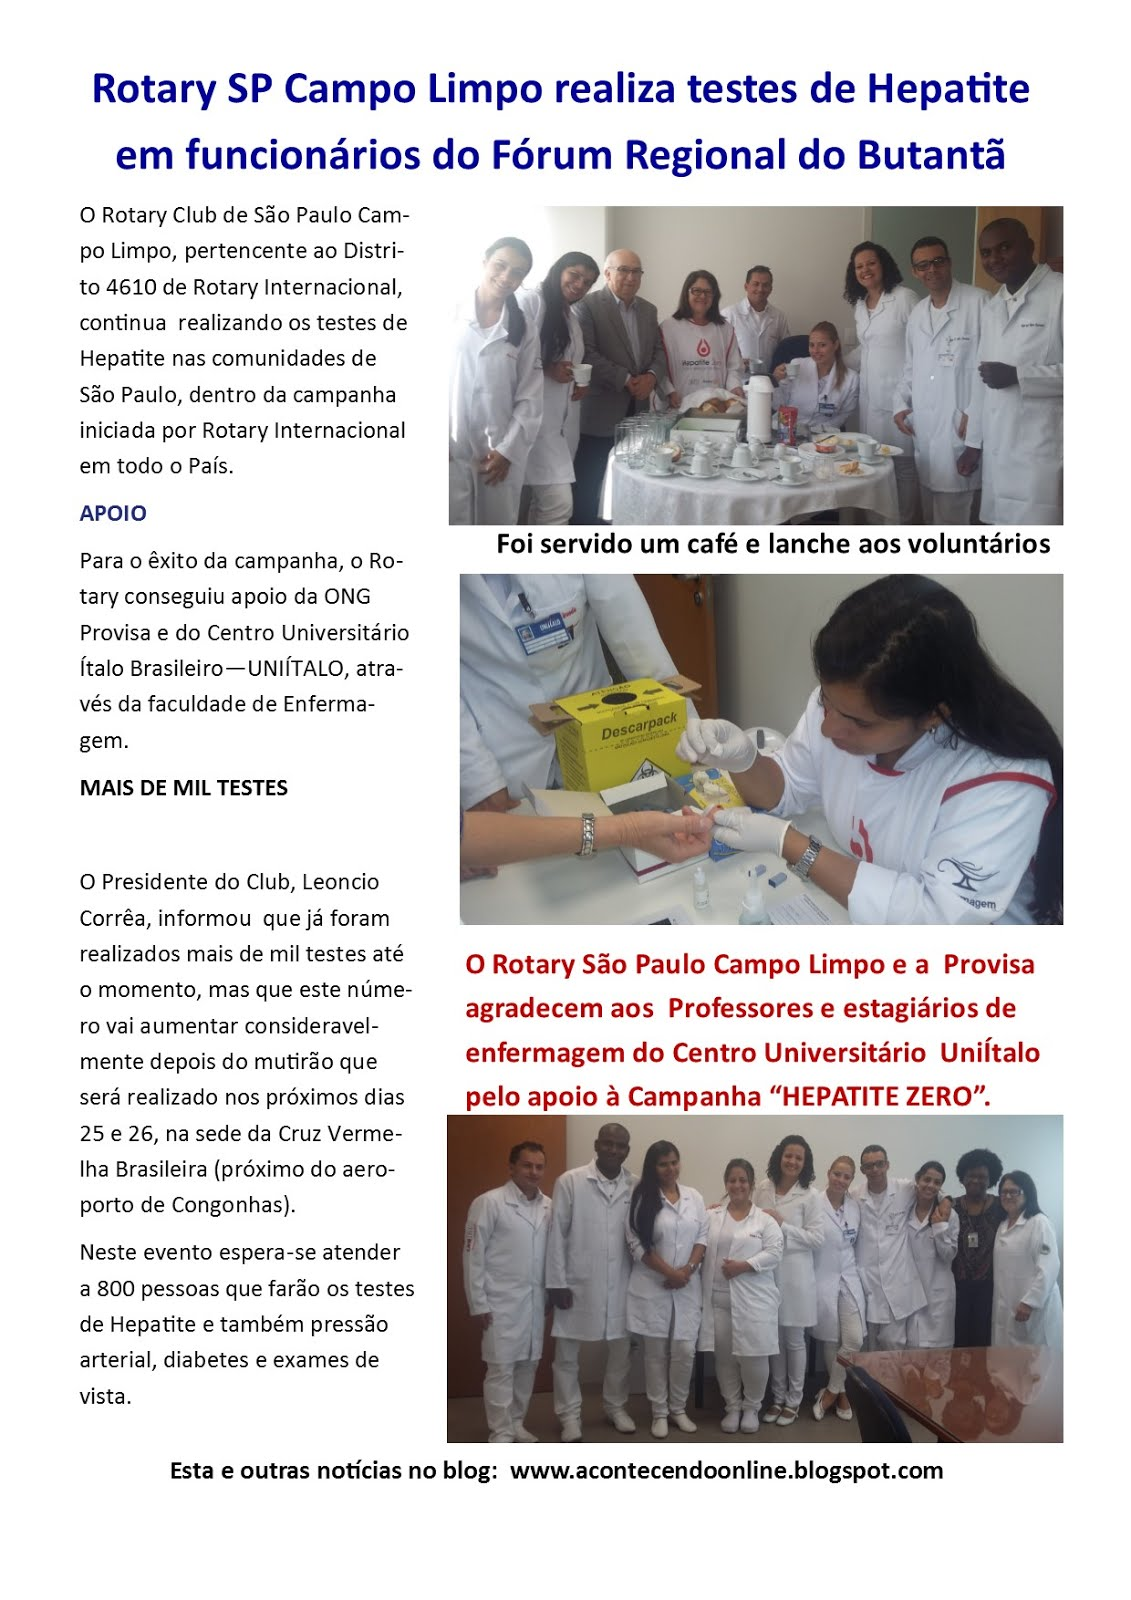 Provisa e Rotary no combate a Hepatite